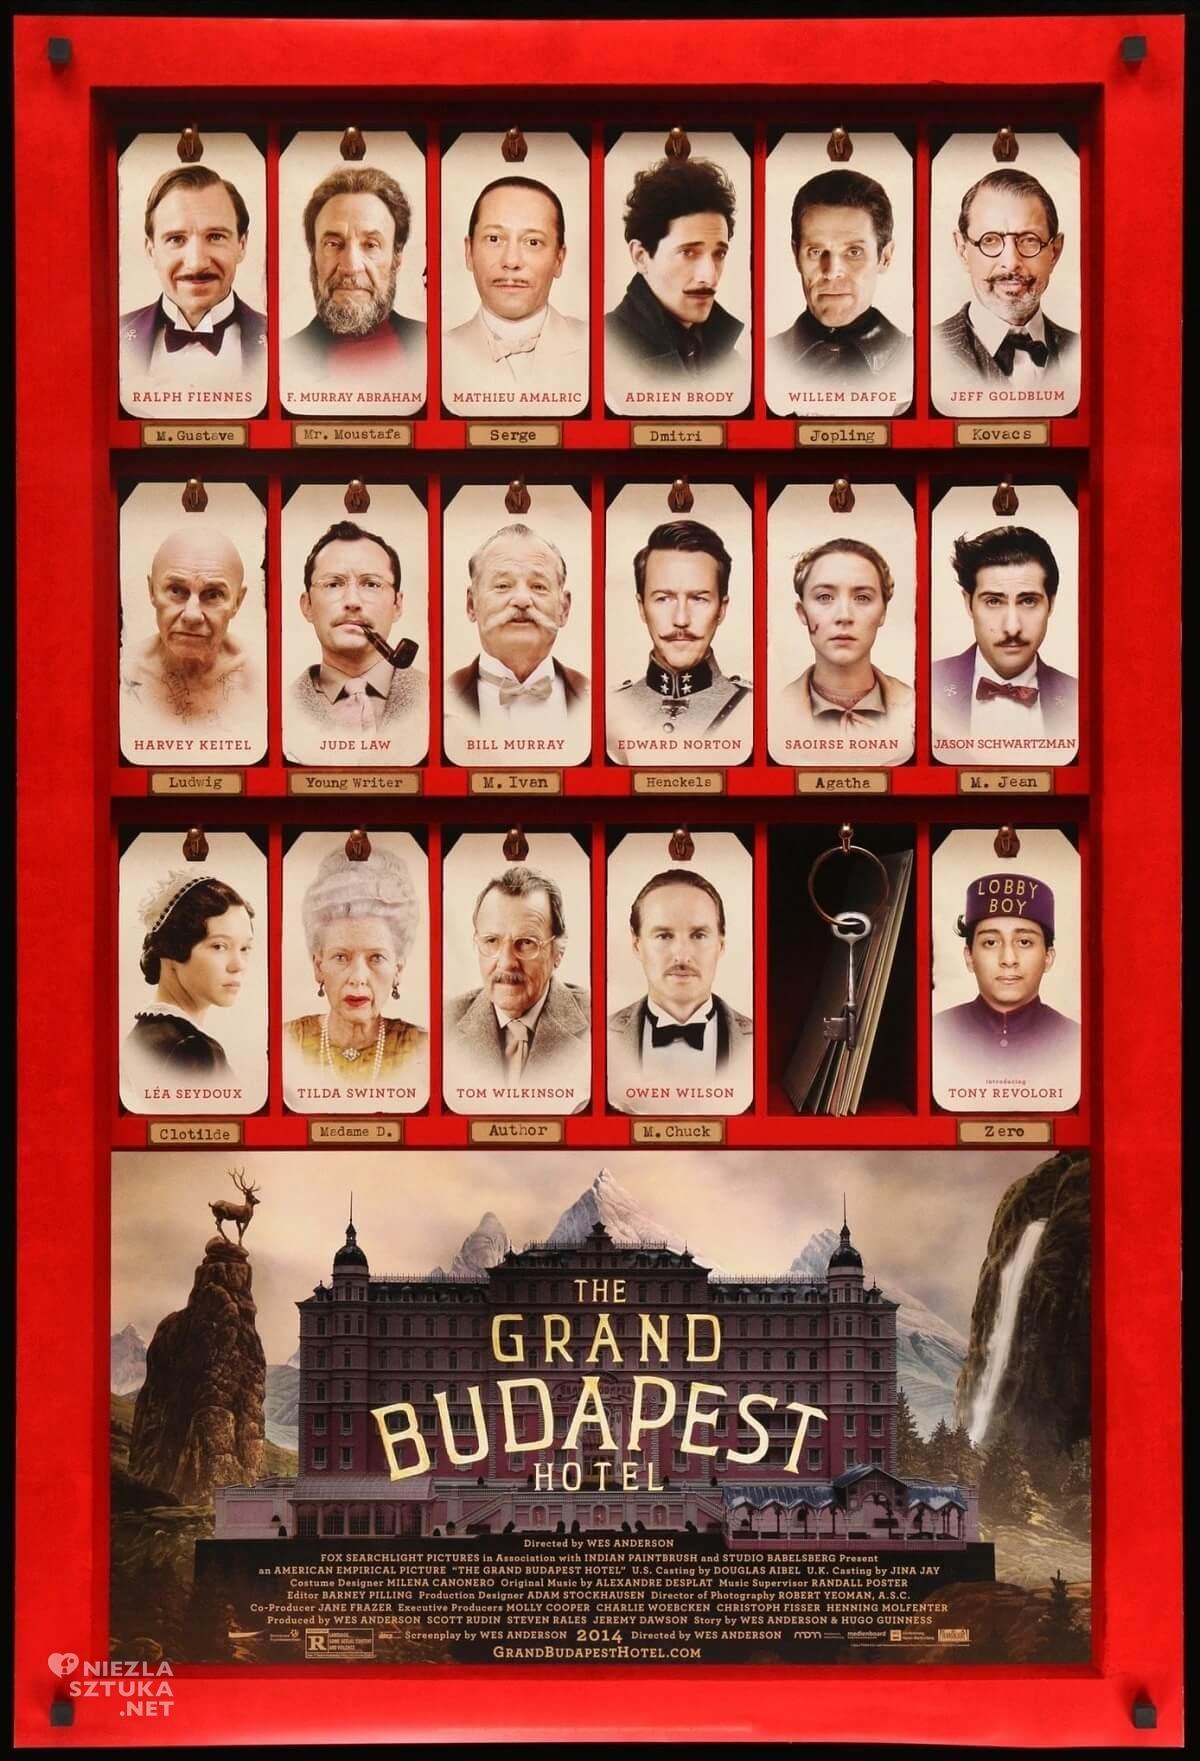 Grand Budapest Hotel, Niezła sztuka